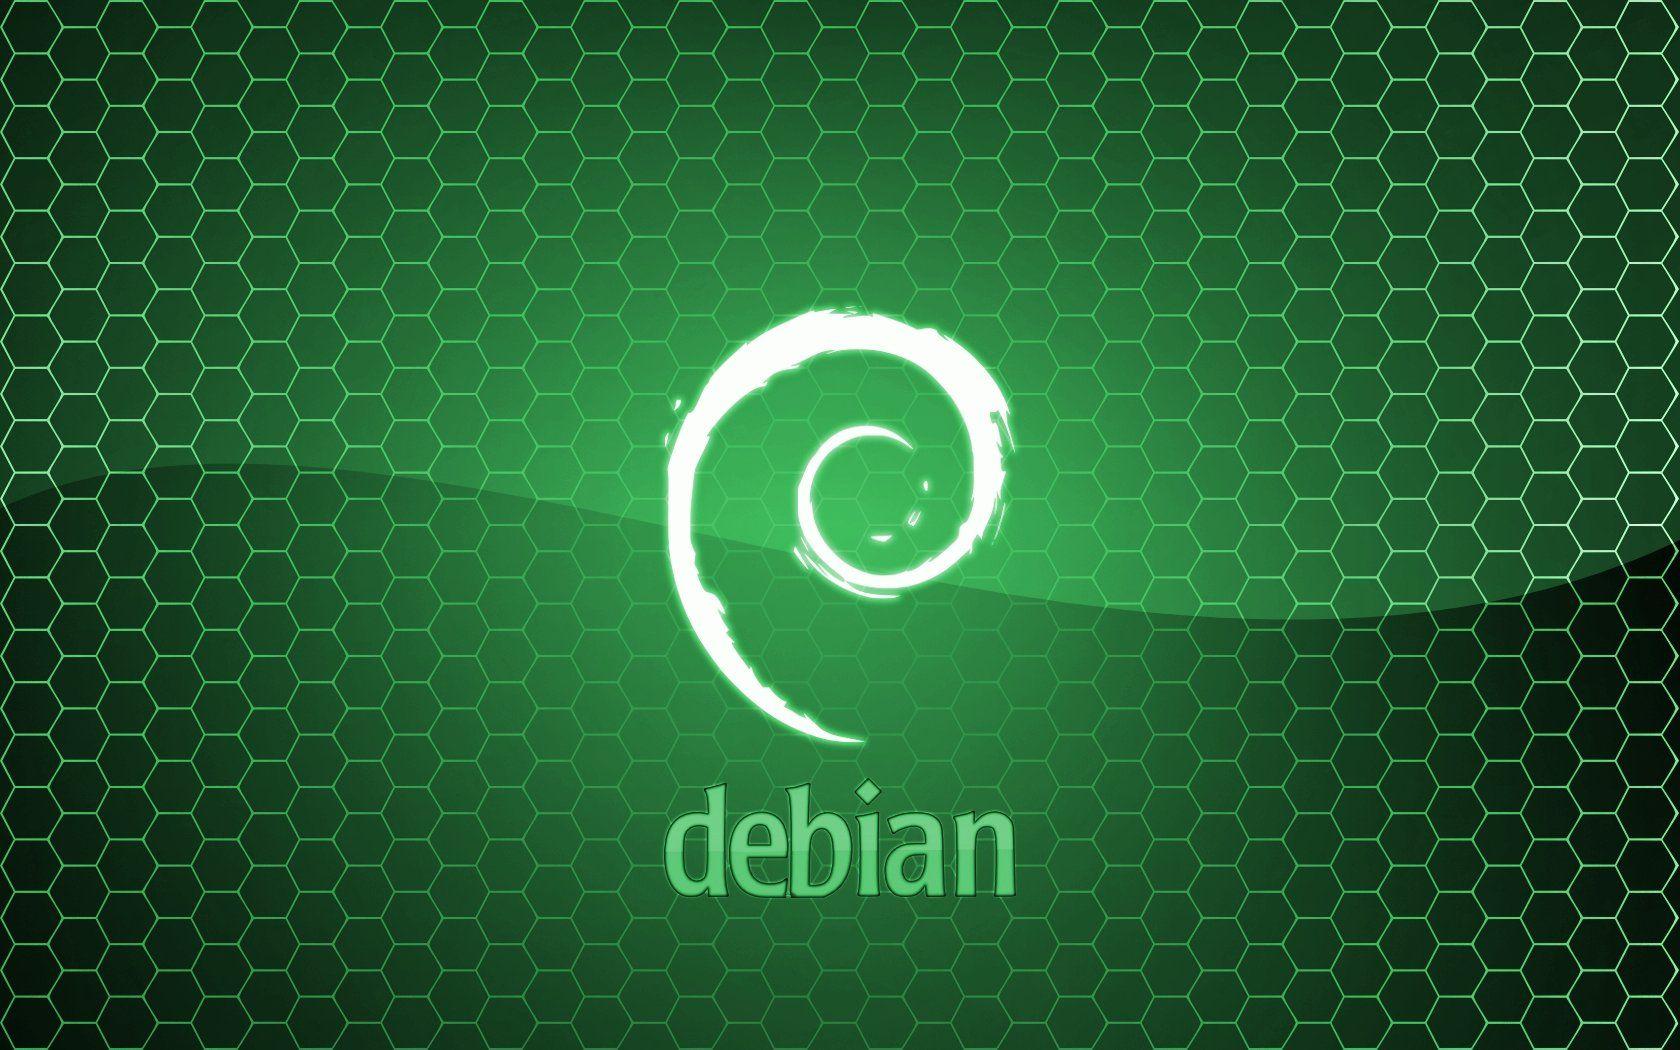 Linux Mint Debian Wallpaper Linux Linux Mint Wallpaper